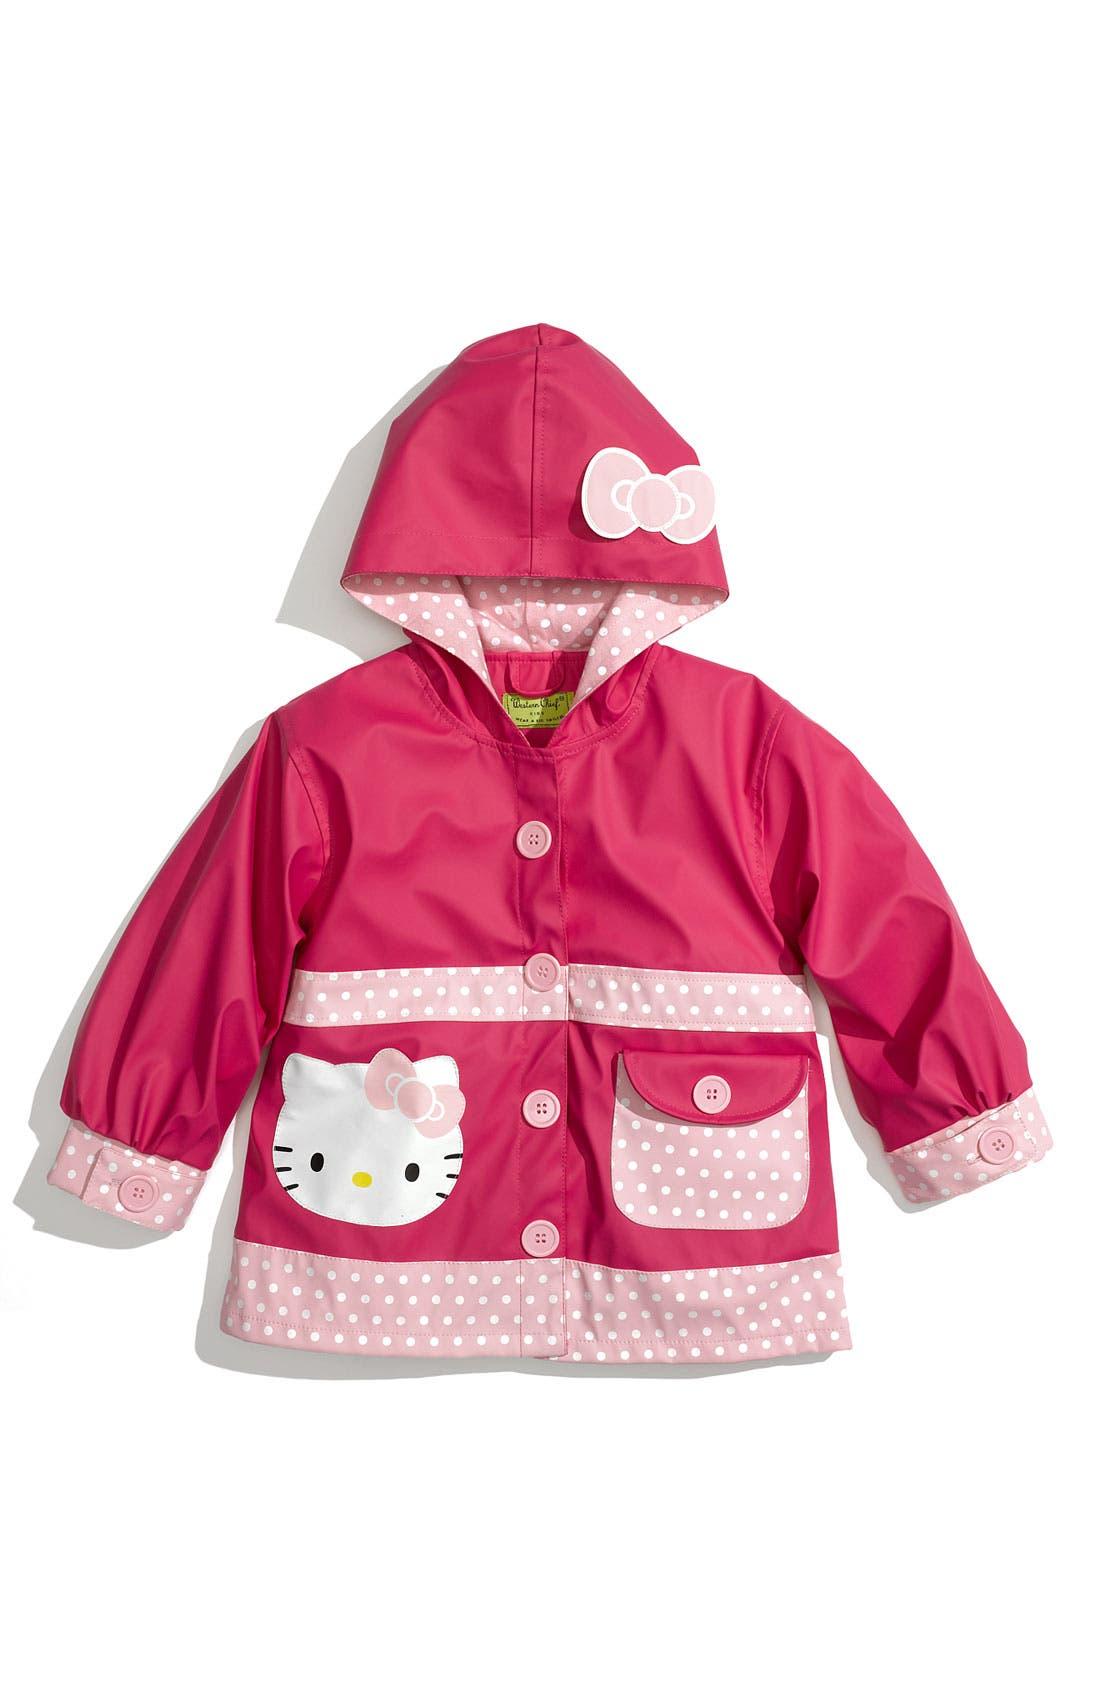 Alternate Image 1 Selected - Western Chief 'Hello Kitty® Ruffles' Raincoat (Toddler Girls & Little Girls)